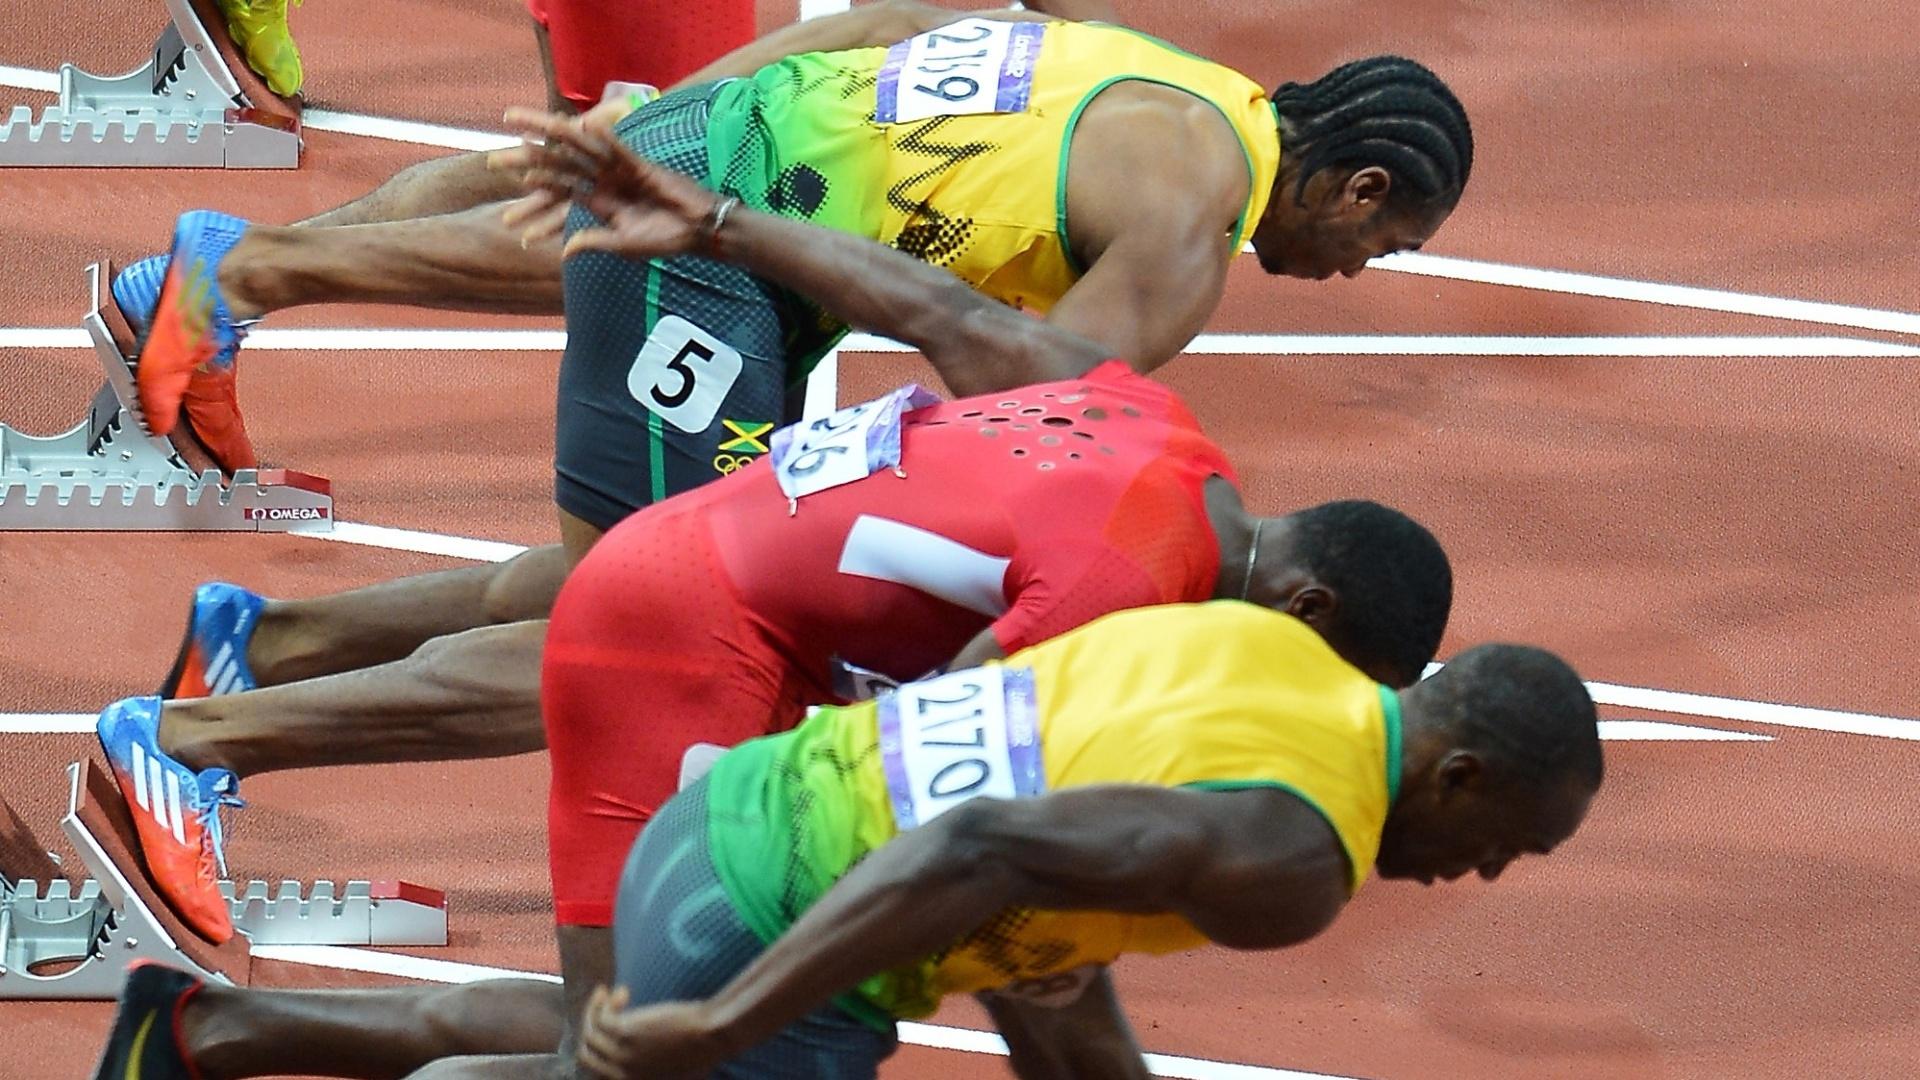 De baixo para cima, favoritos Usain Bolt, Justin Gatlin e Yohan Blake largam na final olímpica dos 100 m rasos